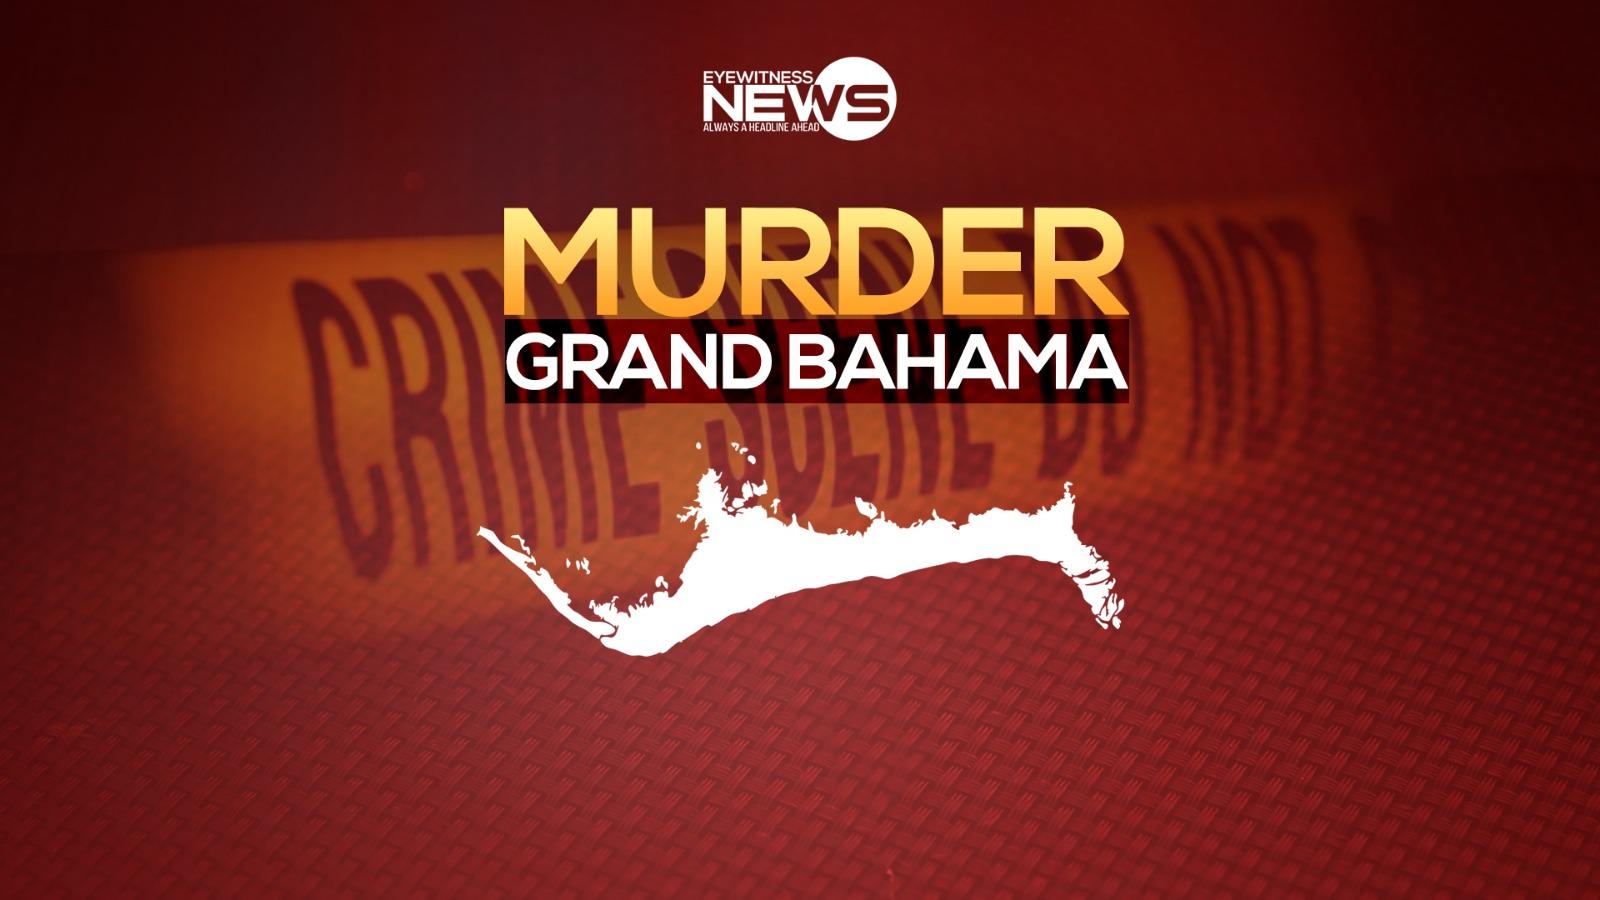 Breaking News: Man in GB dead after stabbing